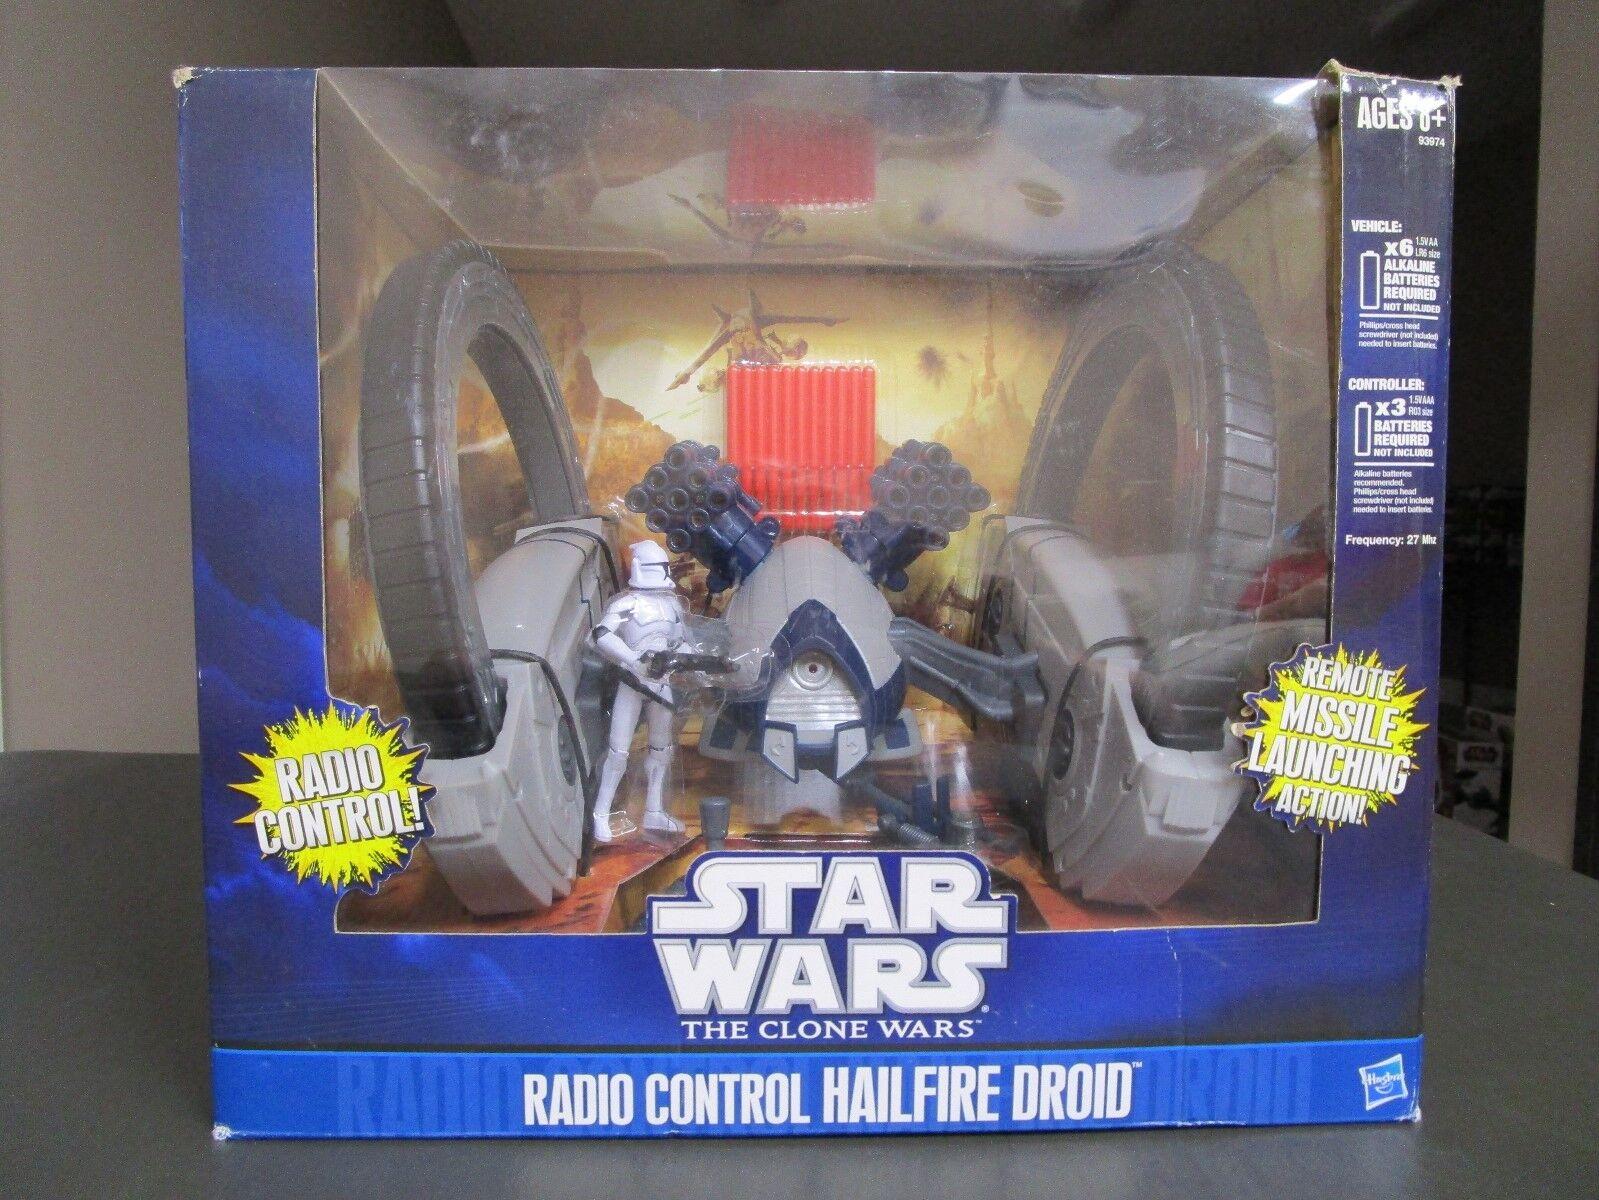 Radio Control Hailfire Droid 2010 STAR WARS The Clone Wars TCW MIB